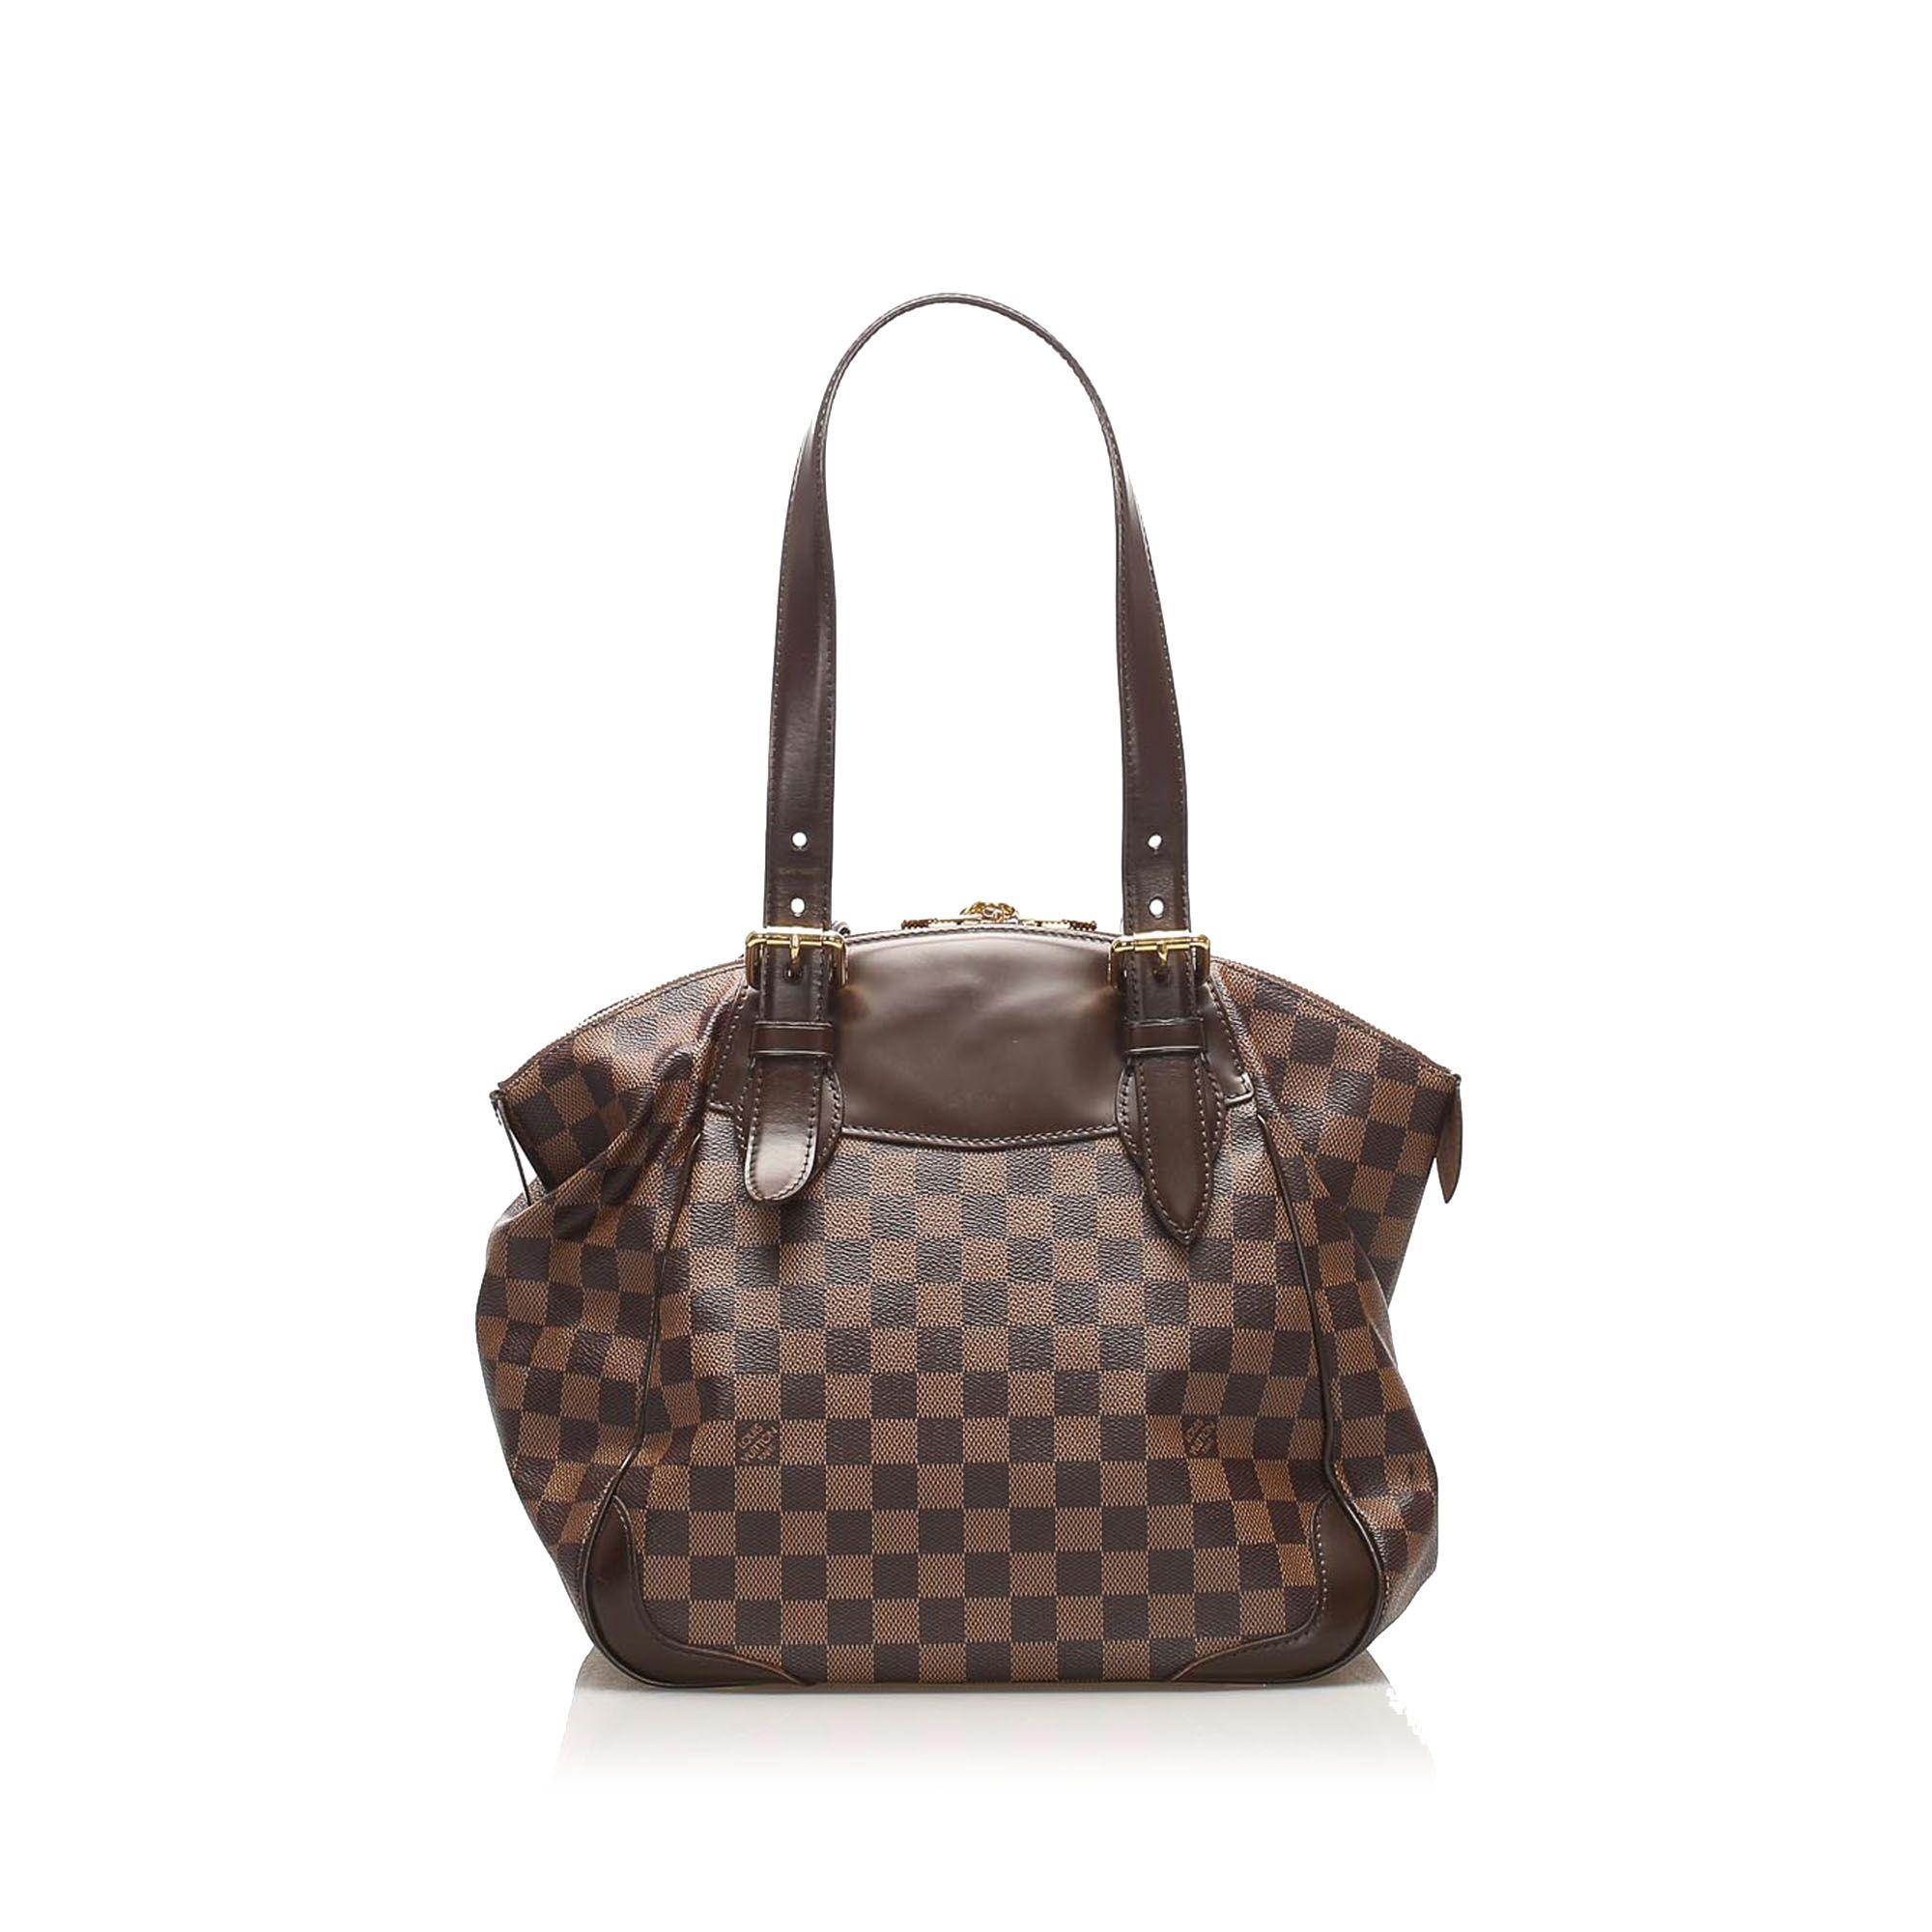 Vintage Louis Vuitton Damier Ebene Verona MM Brown